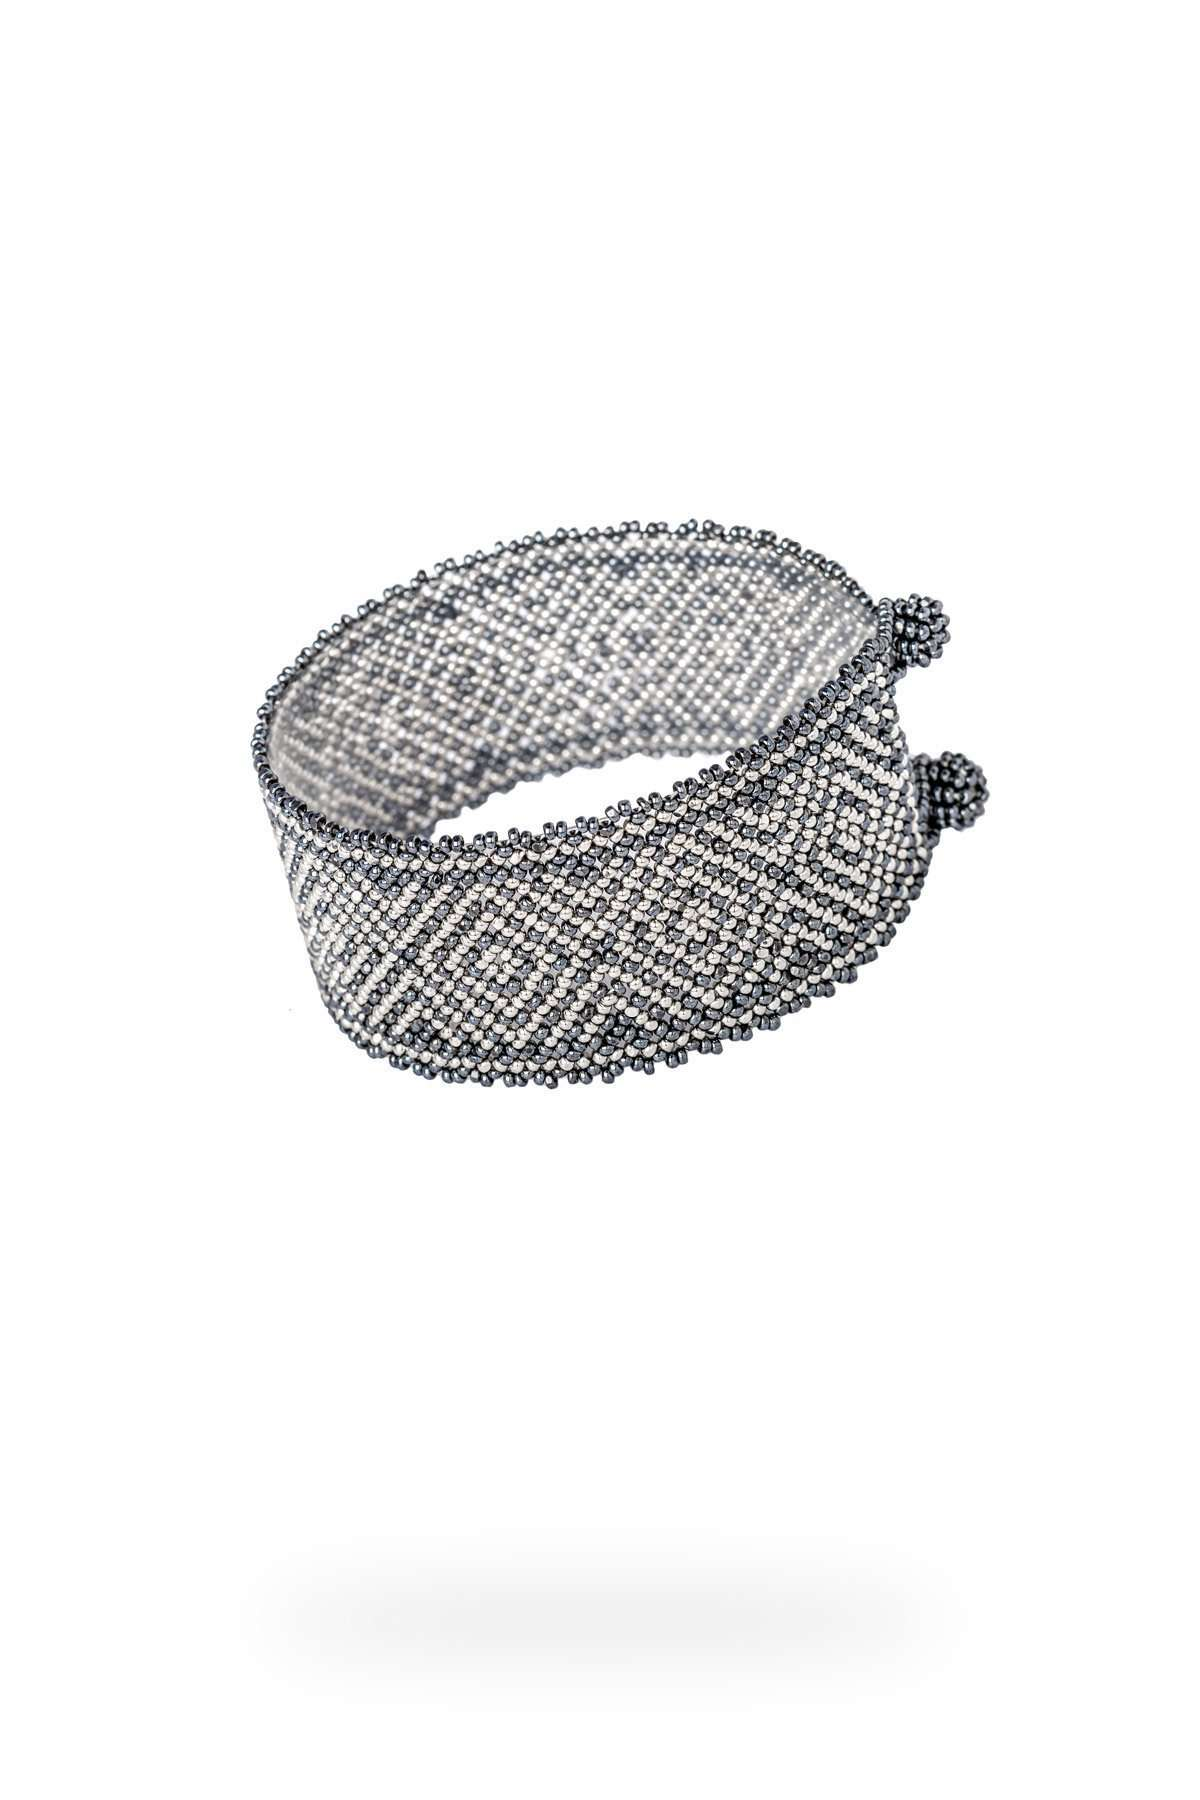 013-brazaletes-mediano-platino-gris